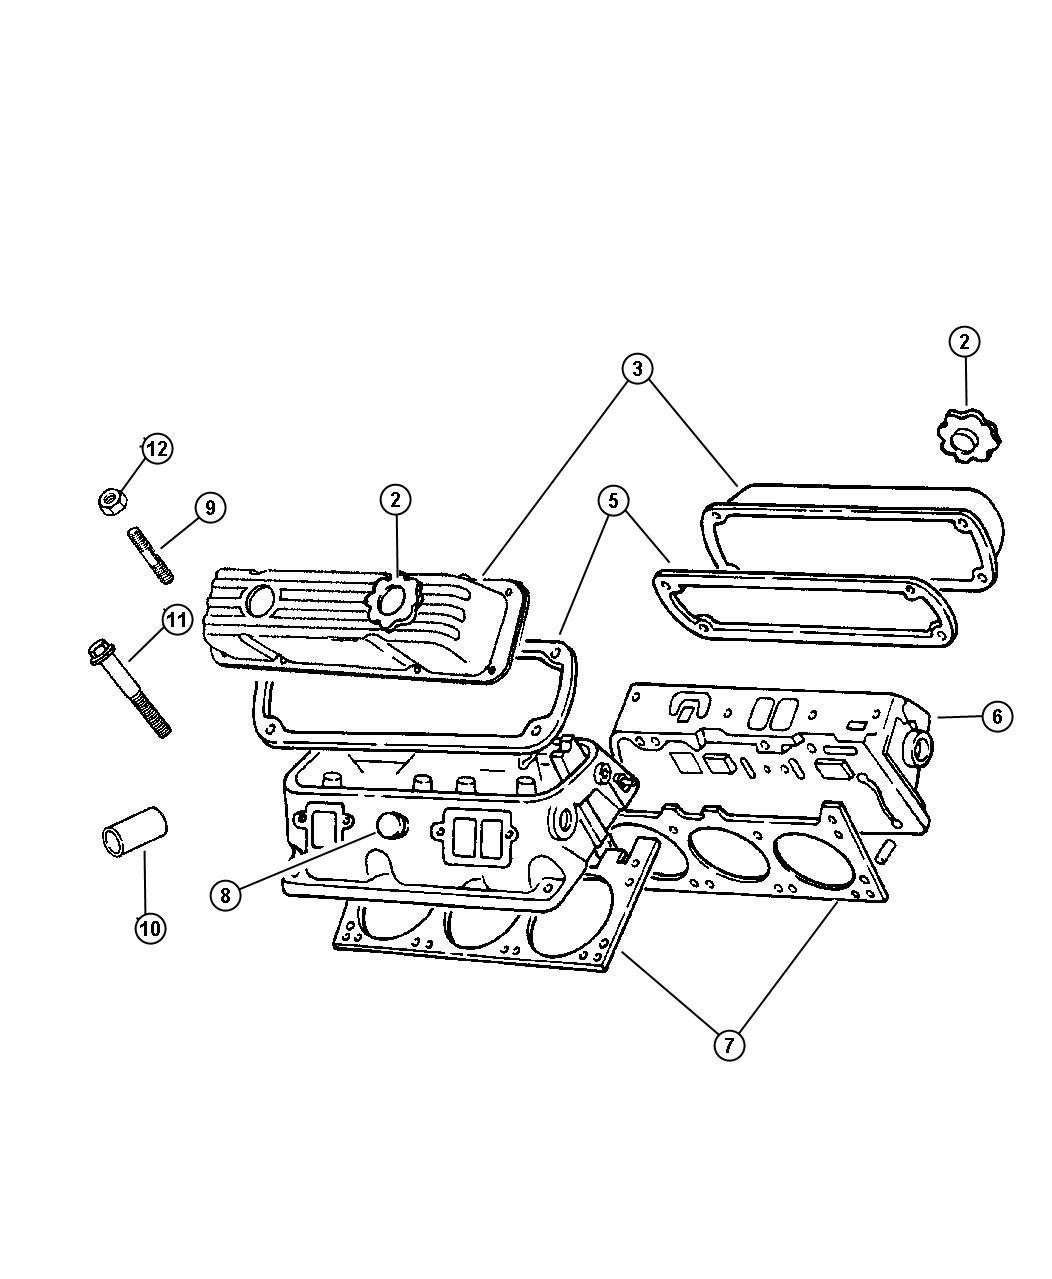 Chrysler 200 Head Cylinder